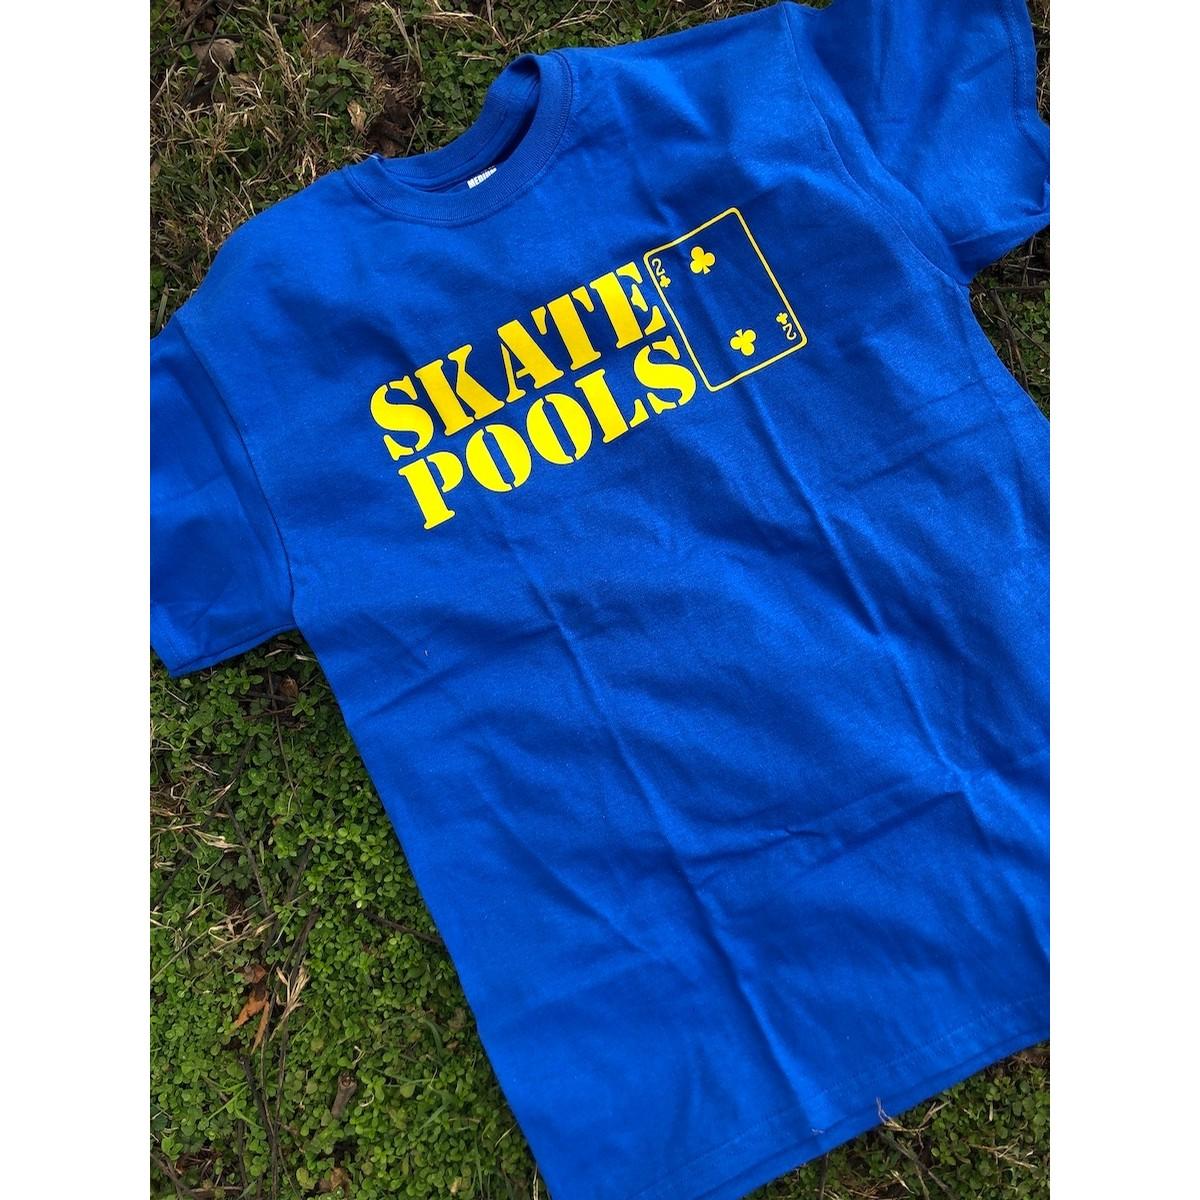 Skate Pools T-Shirt